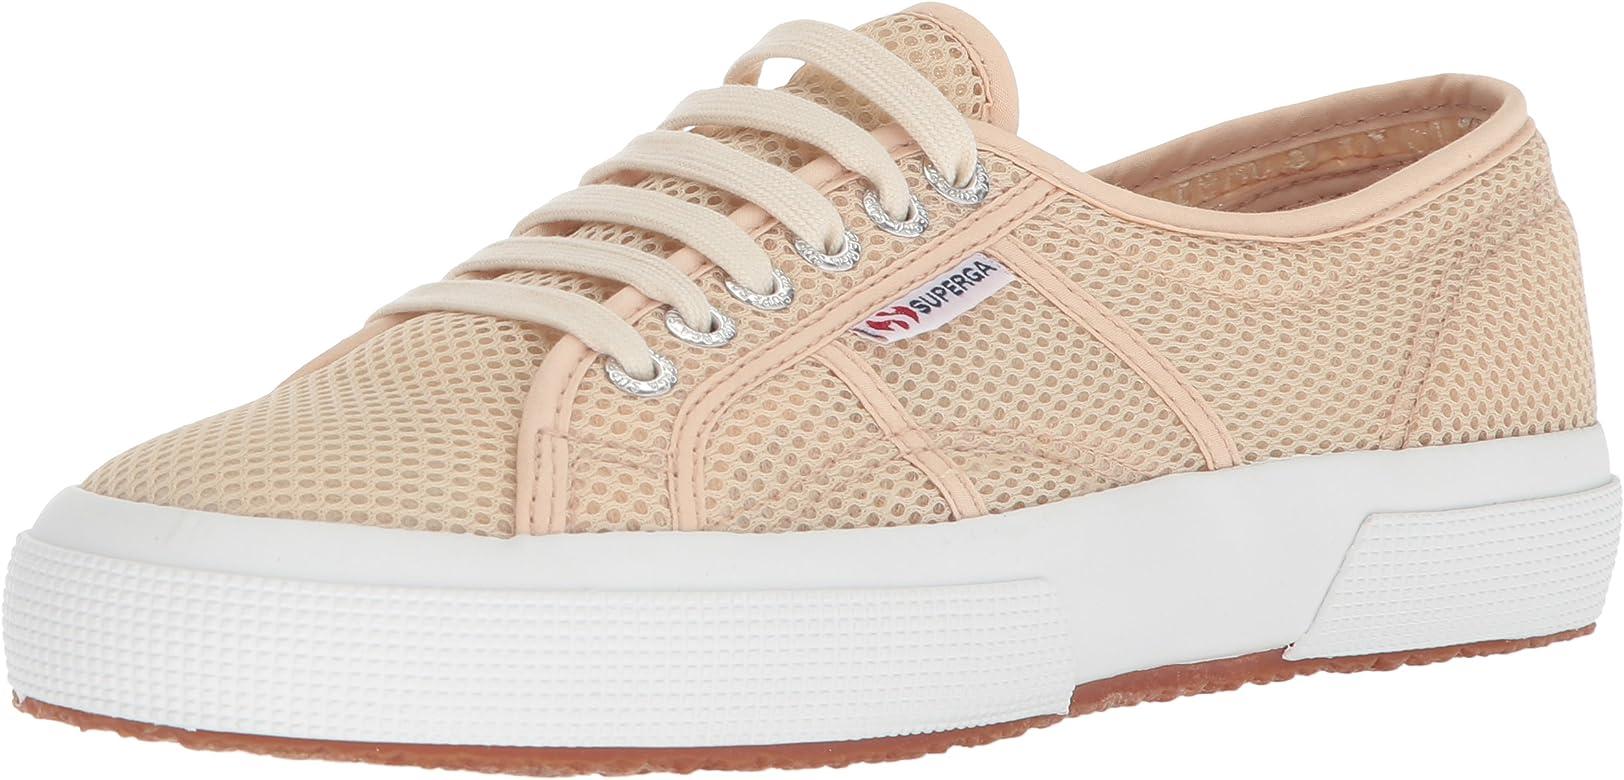 6208e626552ab Women's 2750 Meshu Sneaker